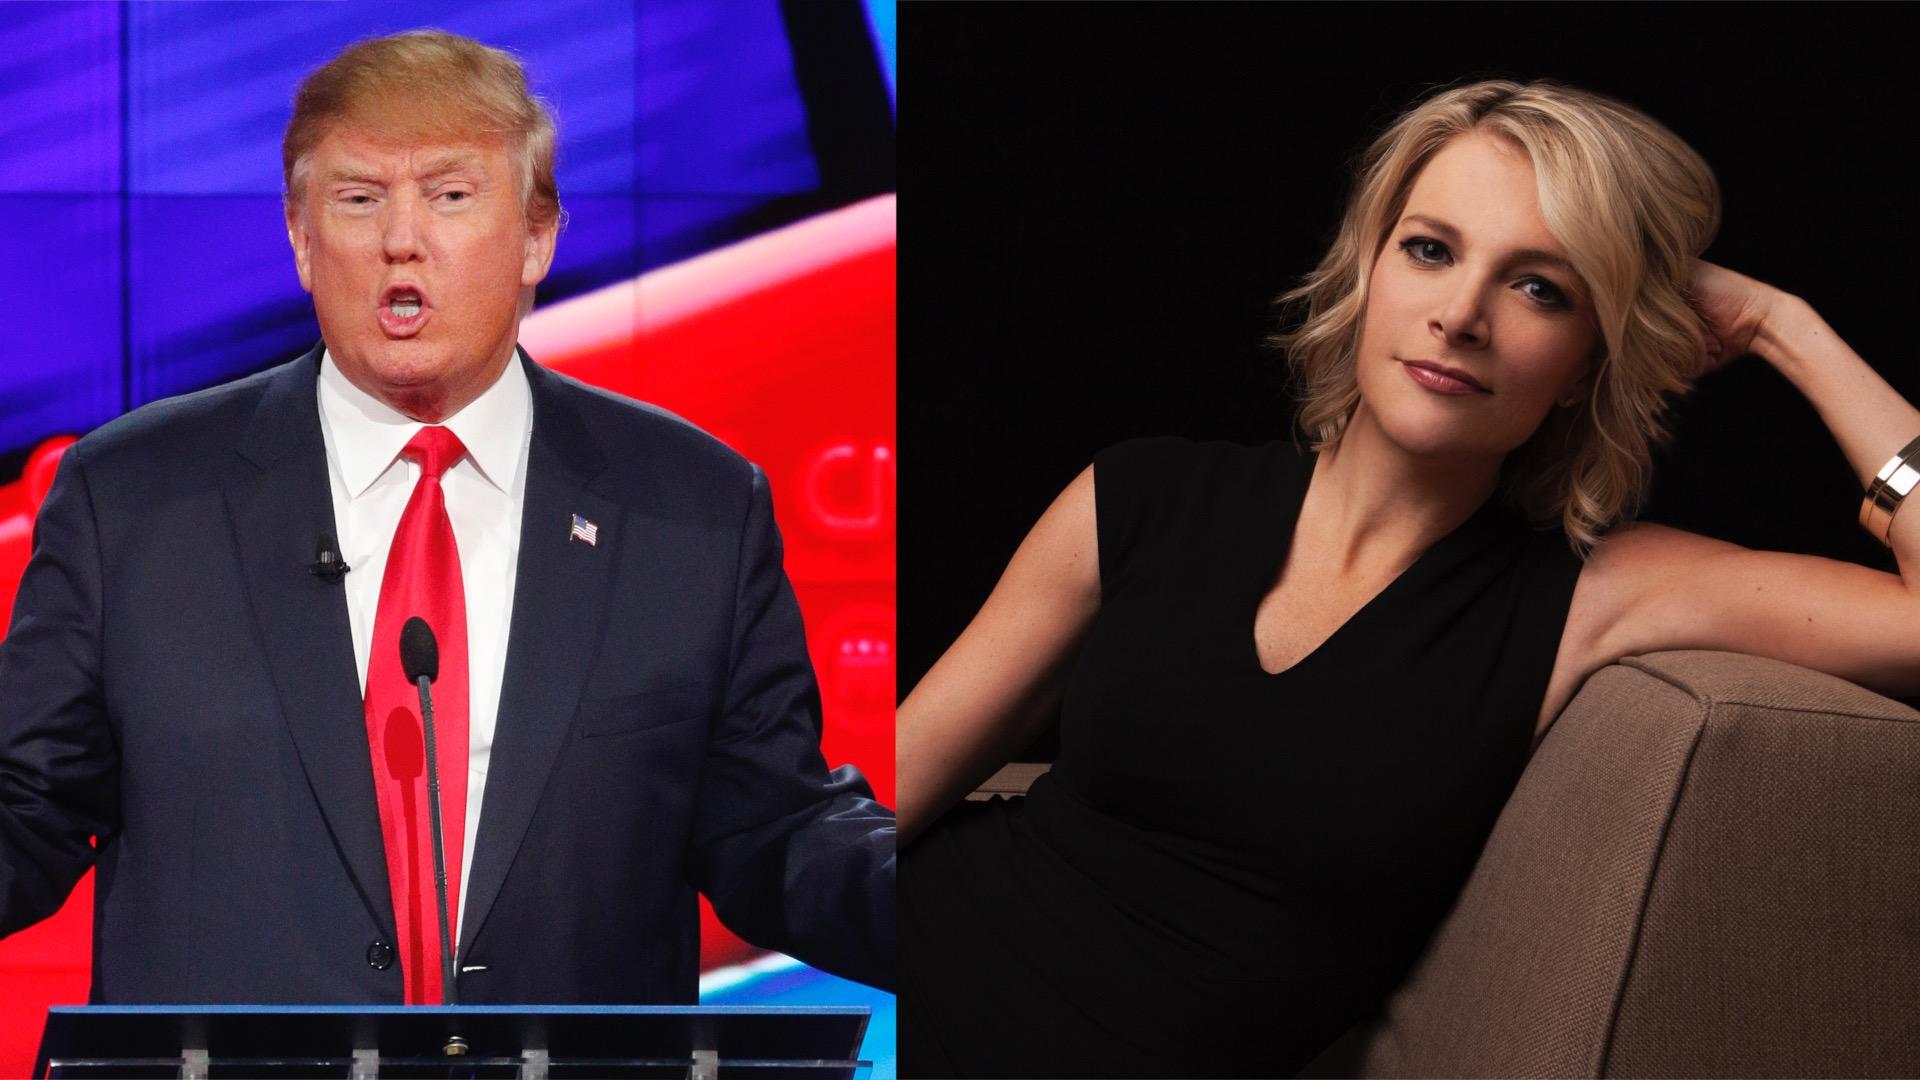 The long, strange history of the Donald Trump-Megyn Kelly feud